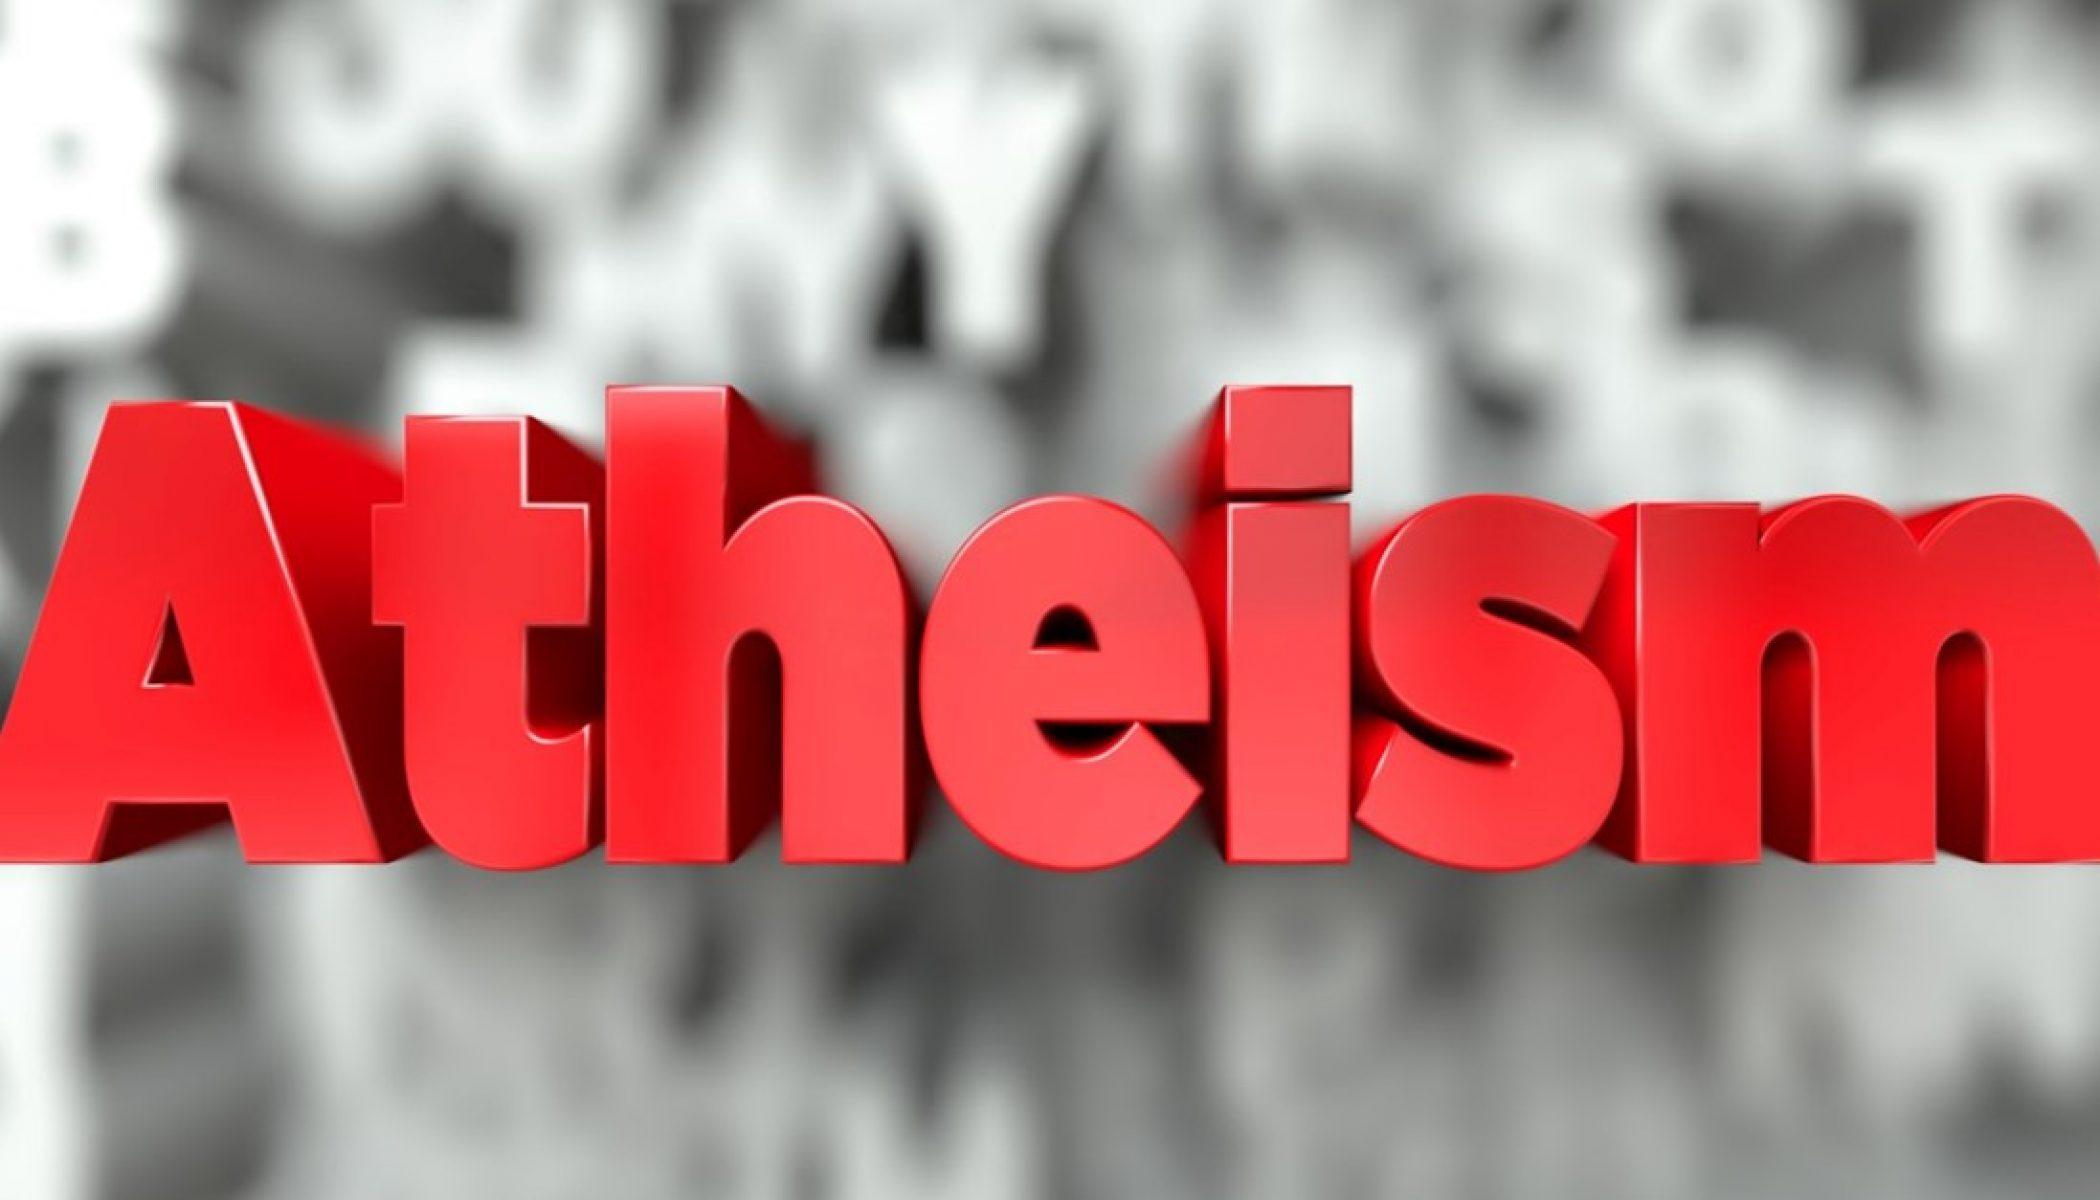 About atheism - Atheist Alliance International